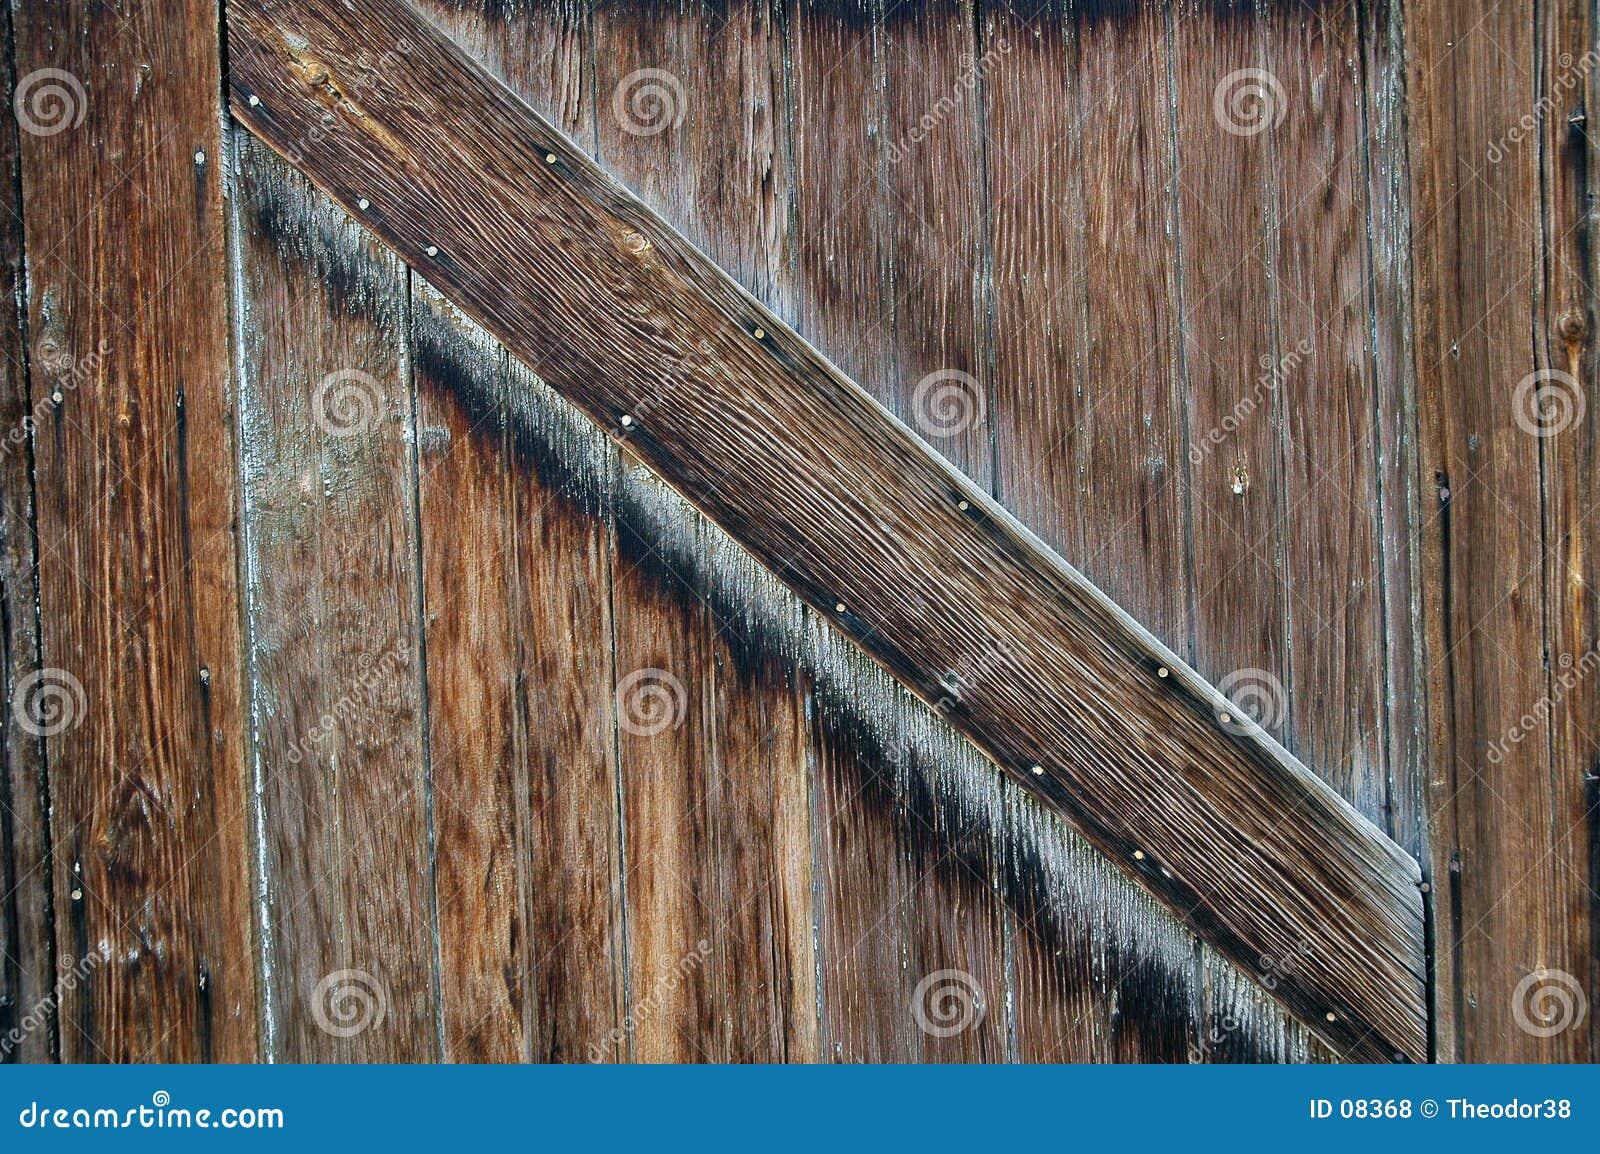 Wood texture-2